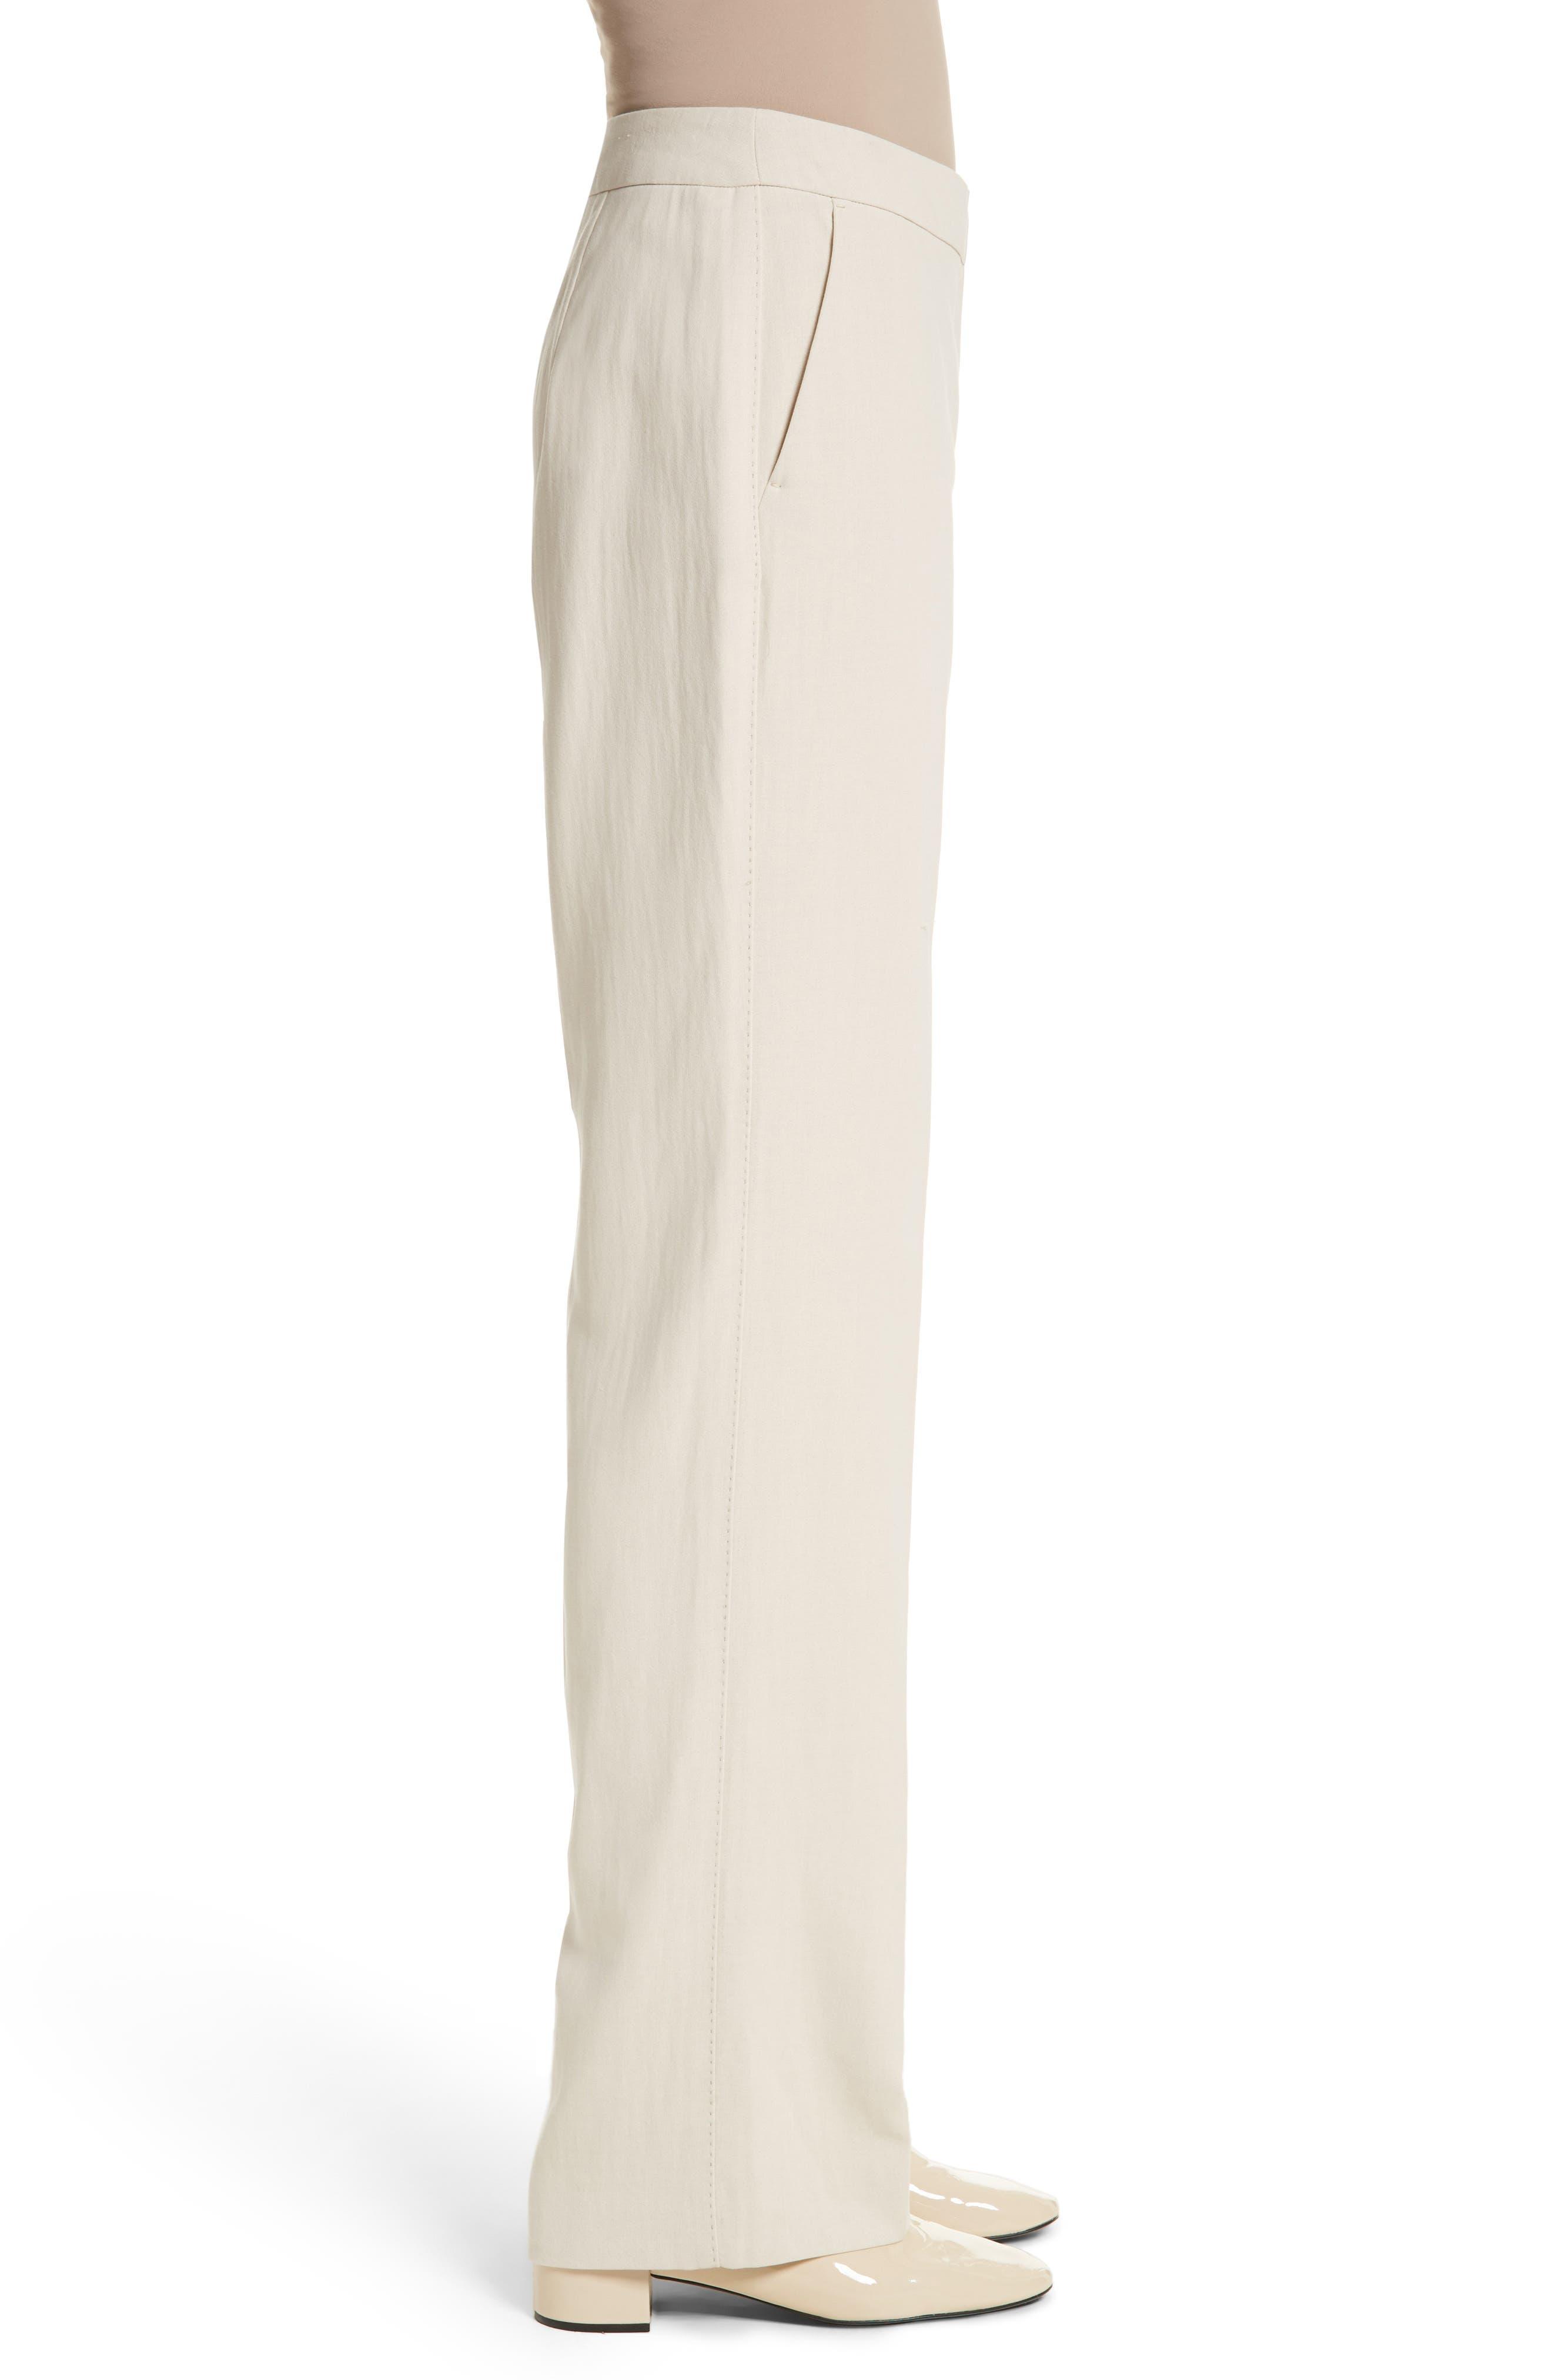 MAX MARA, Cursore Cotton Wide Leg Pants, Alternate thumbnail 3, color, 900